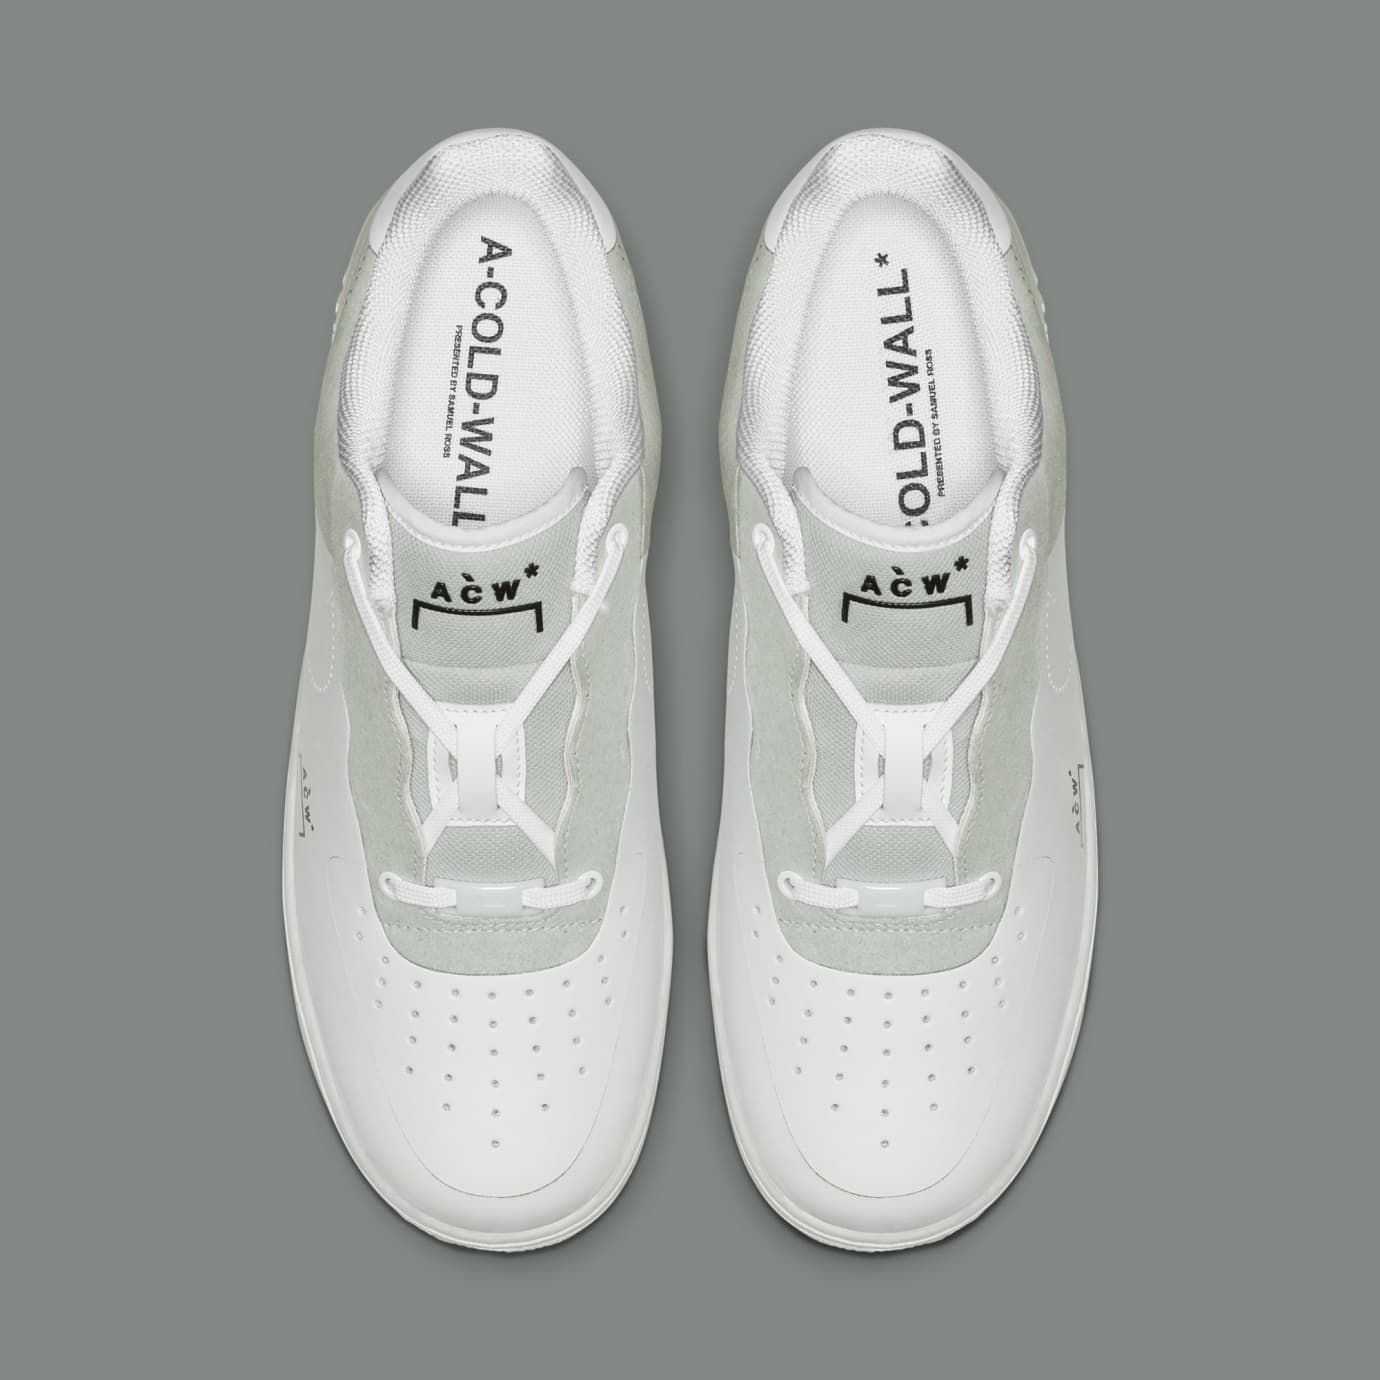 Cold Air Force A WallX Grey Bq6924 Black' 'whitelight Low 1 Nike TFclJ1K